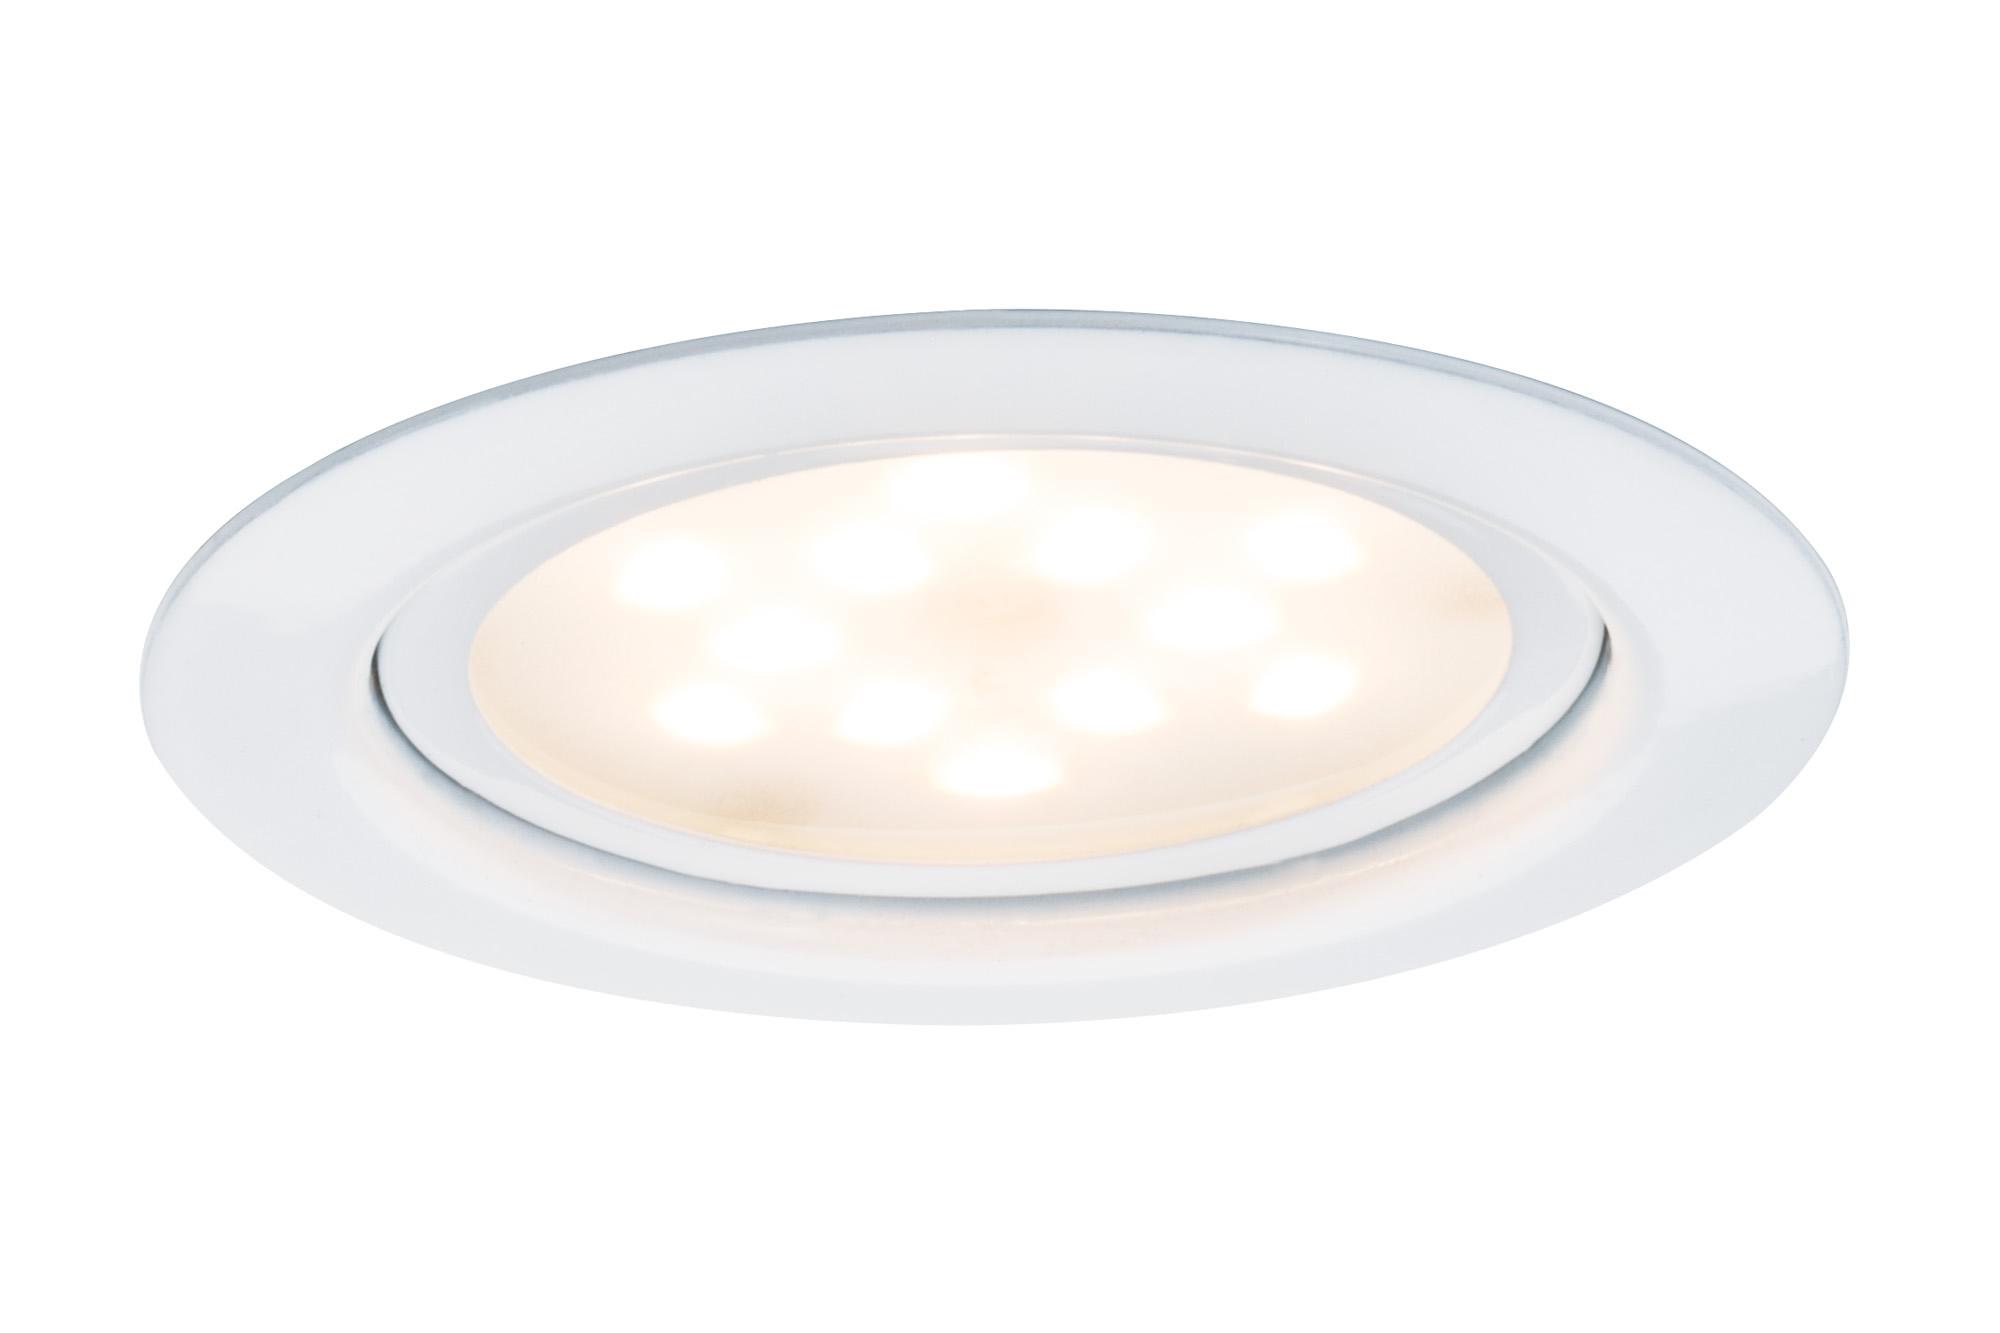 Paulmann. 93555 M?bel EBL LED 1x4W 65mm Ws